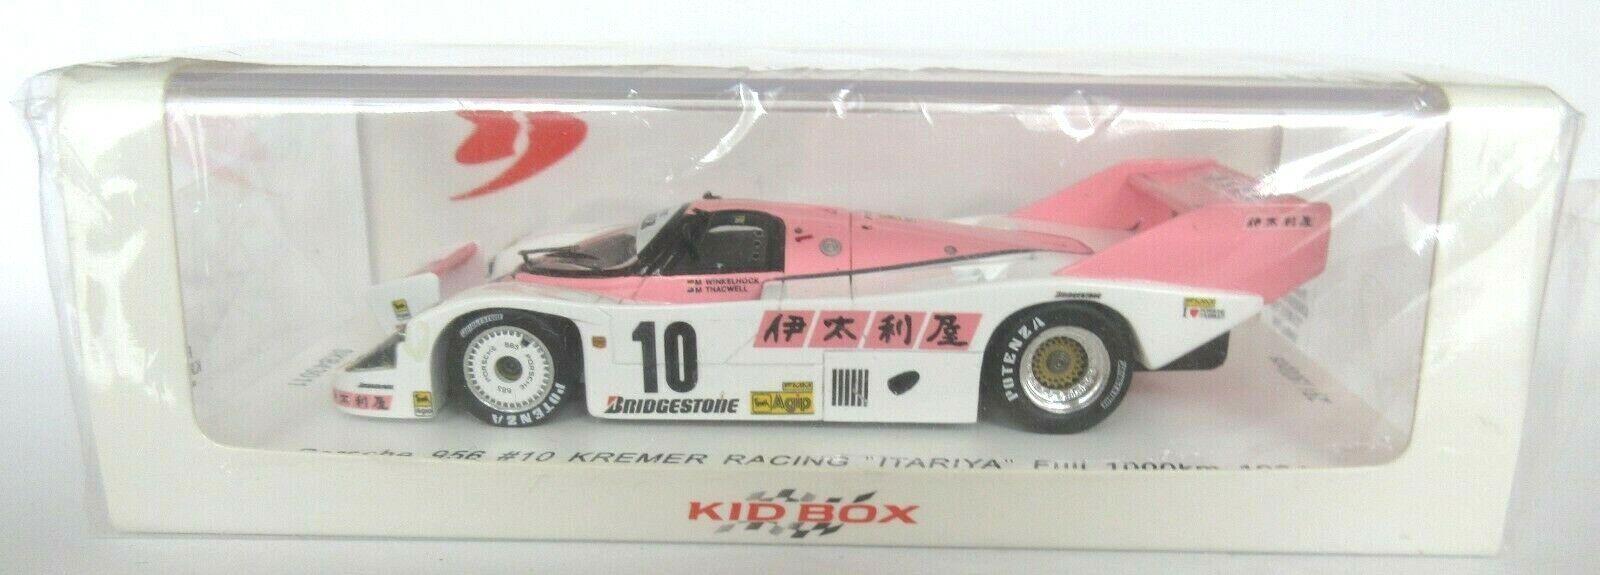 PORSCHE 956 #10 KREMER RACING FUJI 1000km 1984 1/43 Spark SKB43011 SÉRIE LIMITÉE